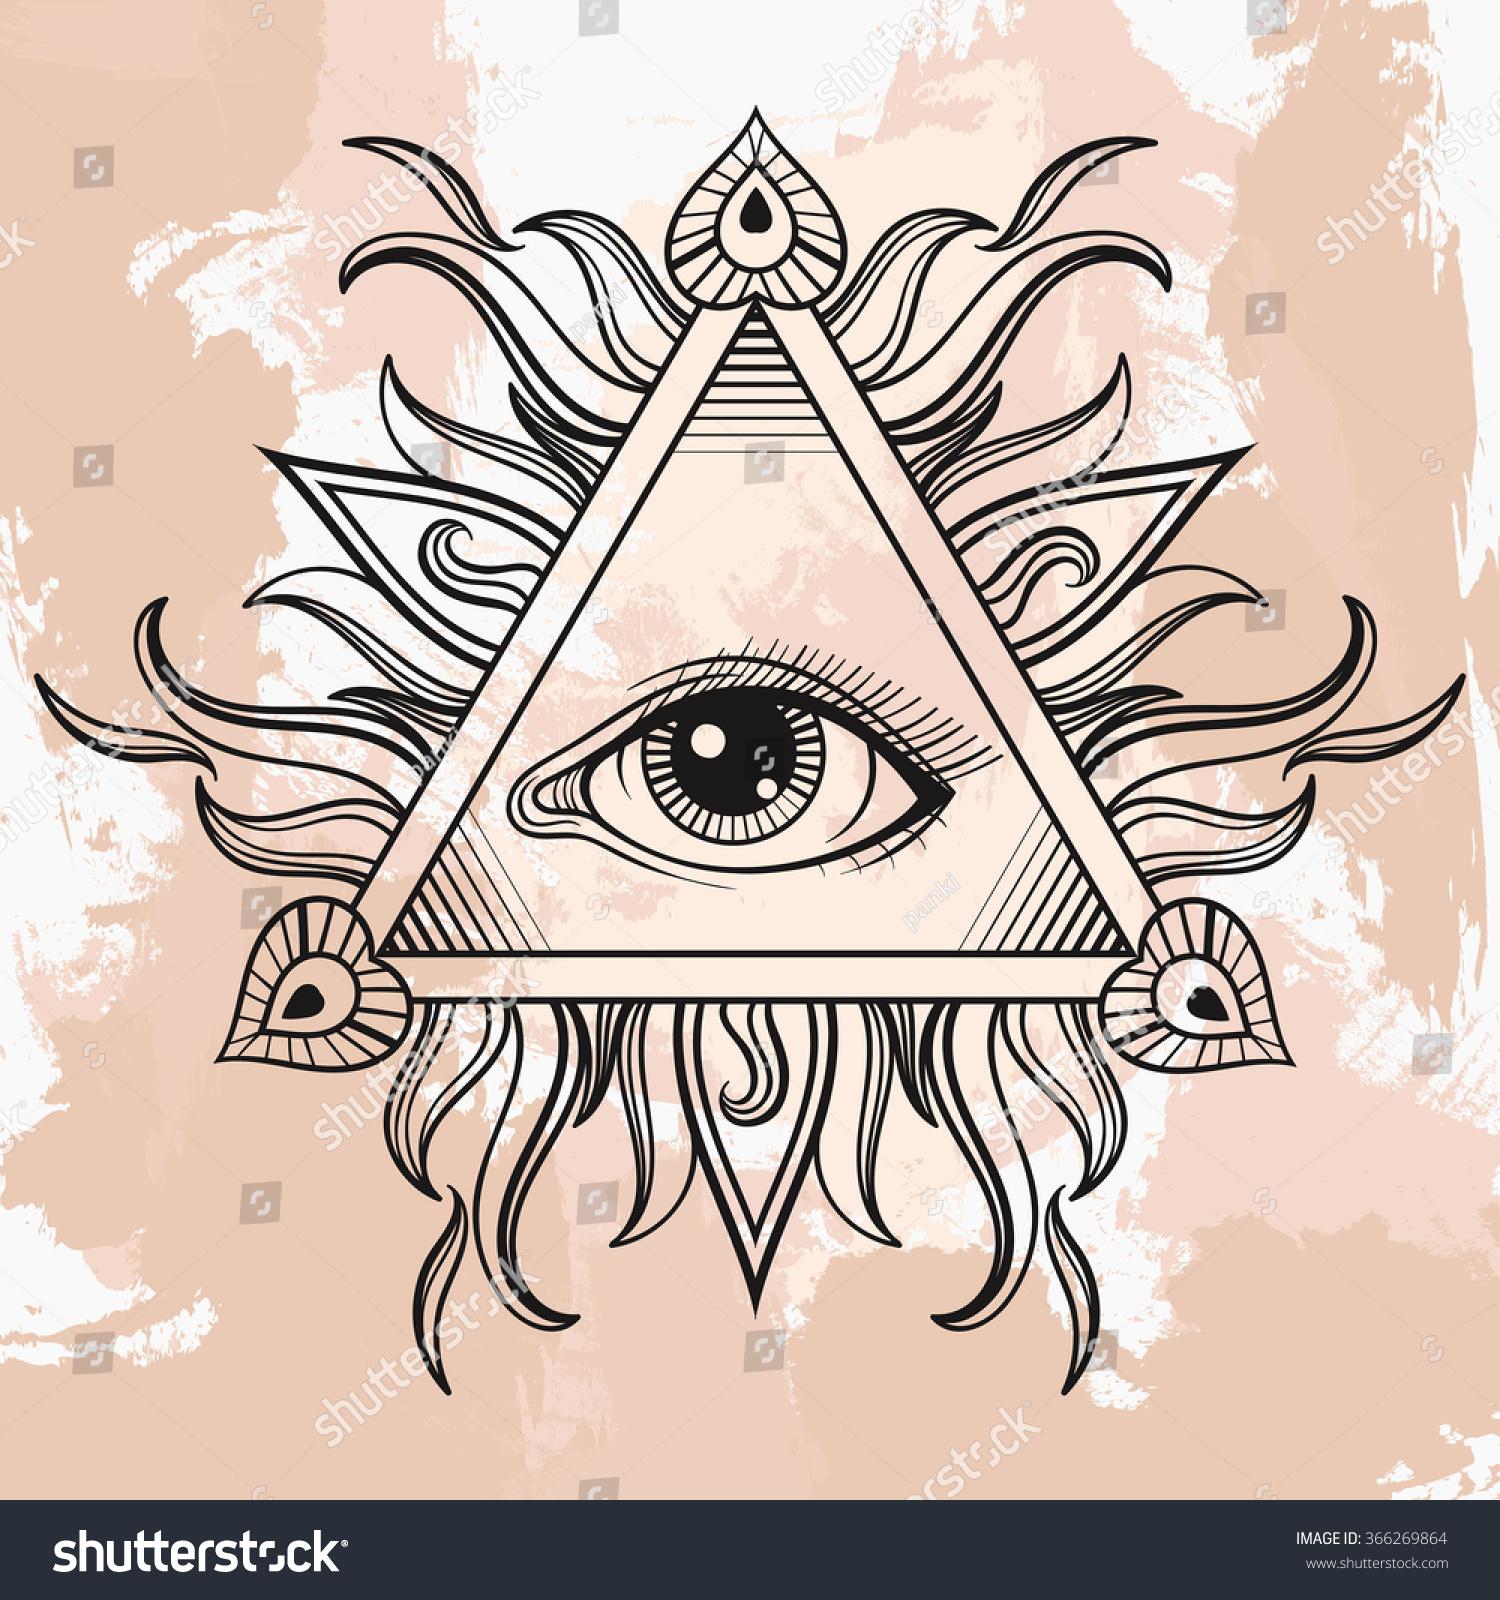 All Seeing Eye Pyramid Symbol Illumination Stock Illustration